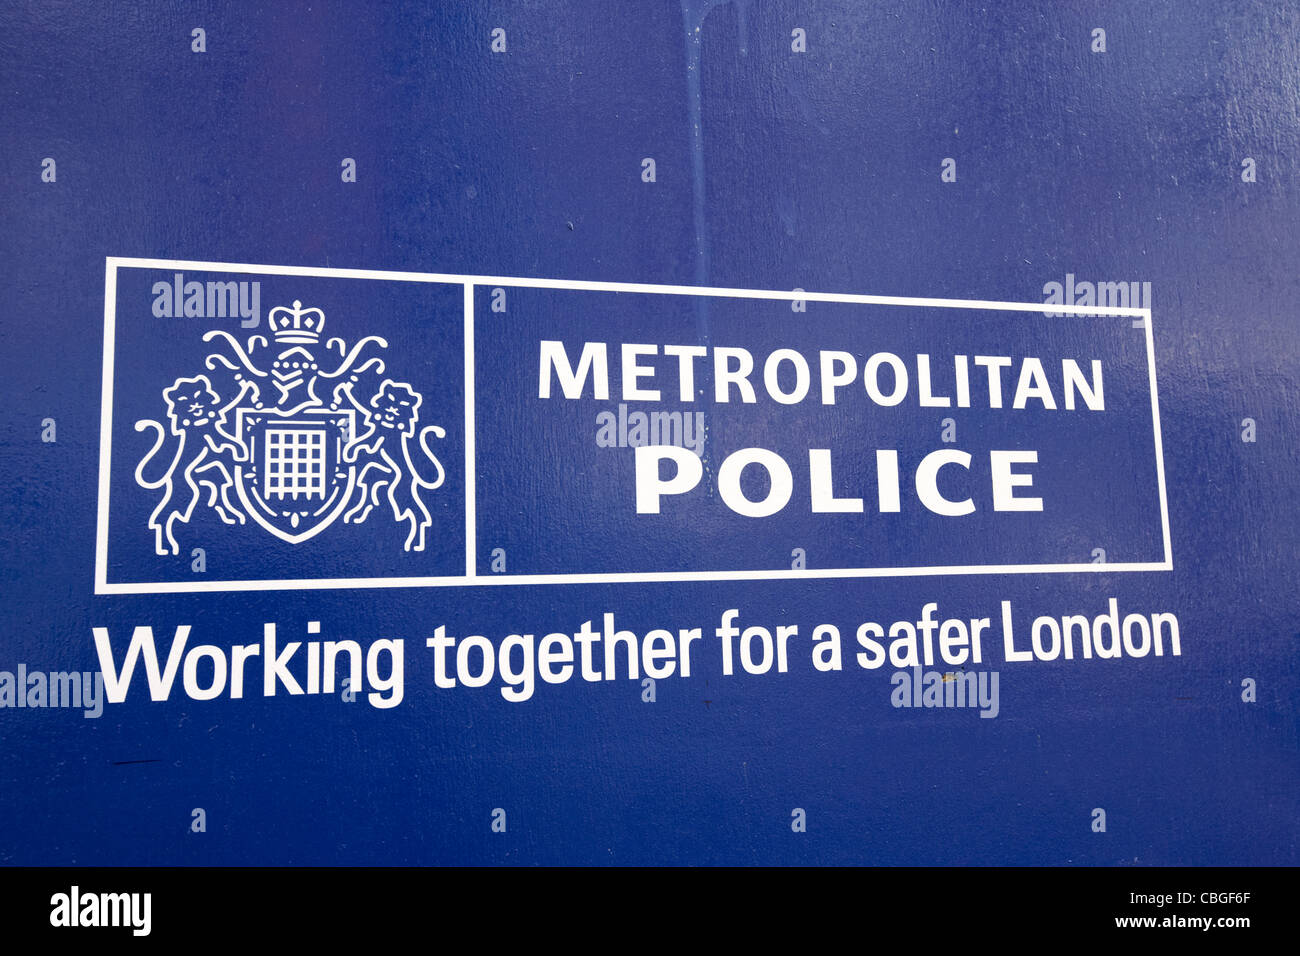 metropolitan police logo and working together for a safer london slogan london england uk united kingdom - Stock Image